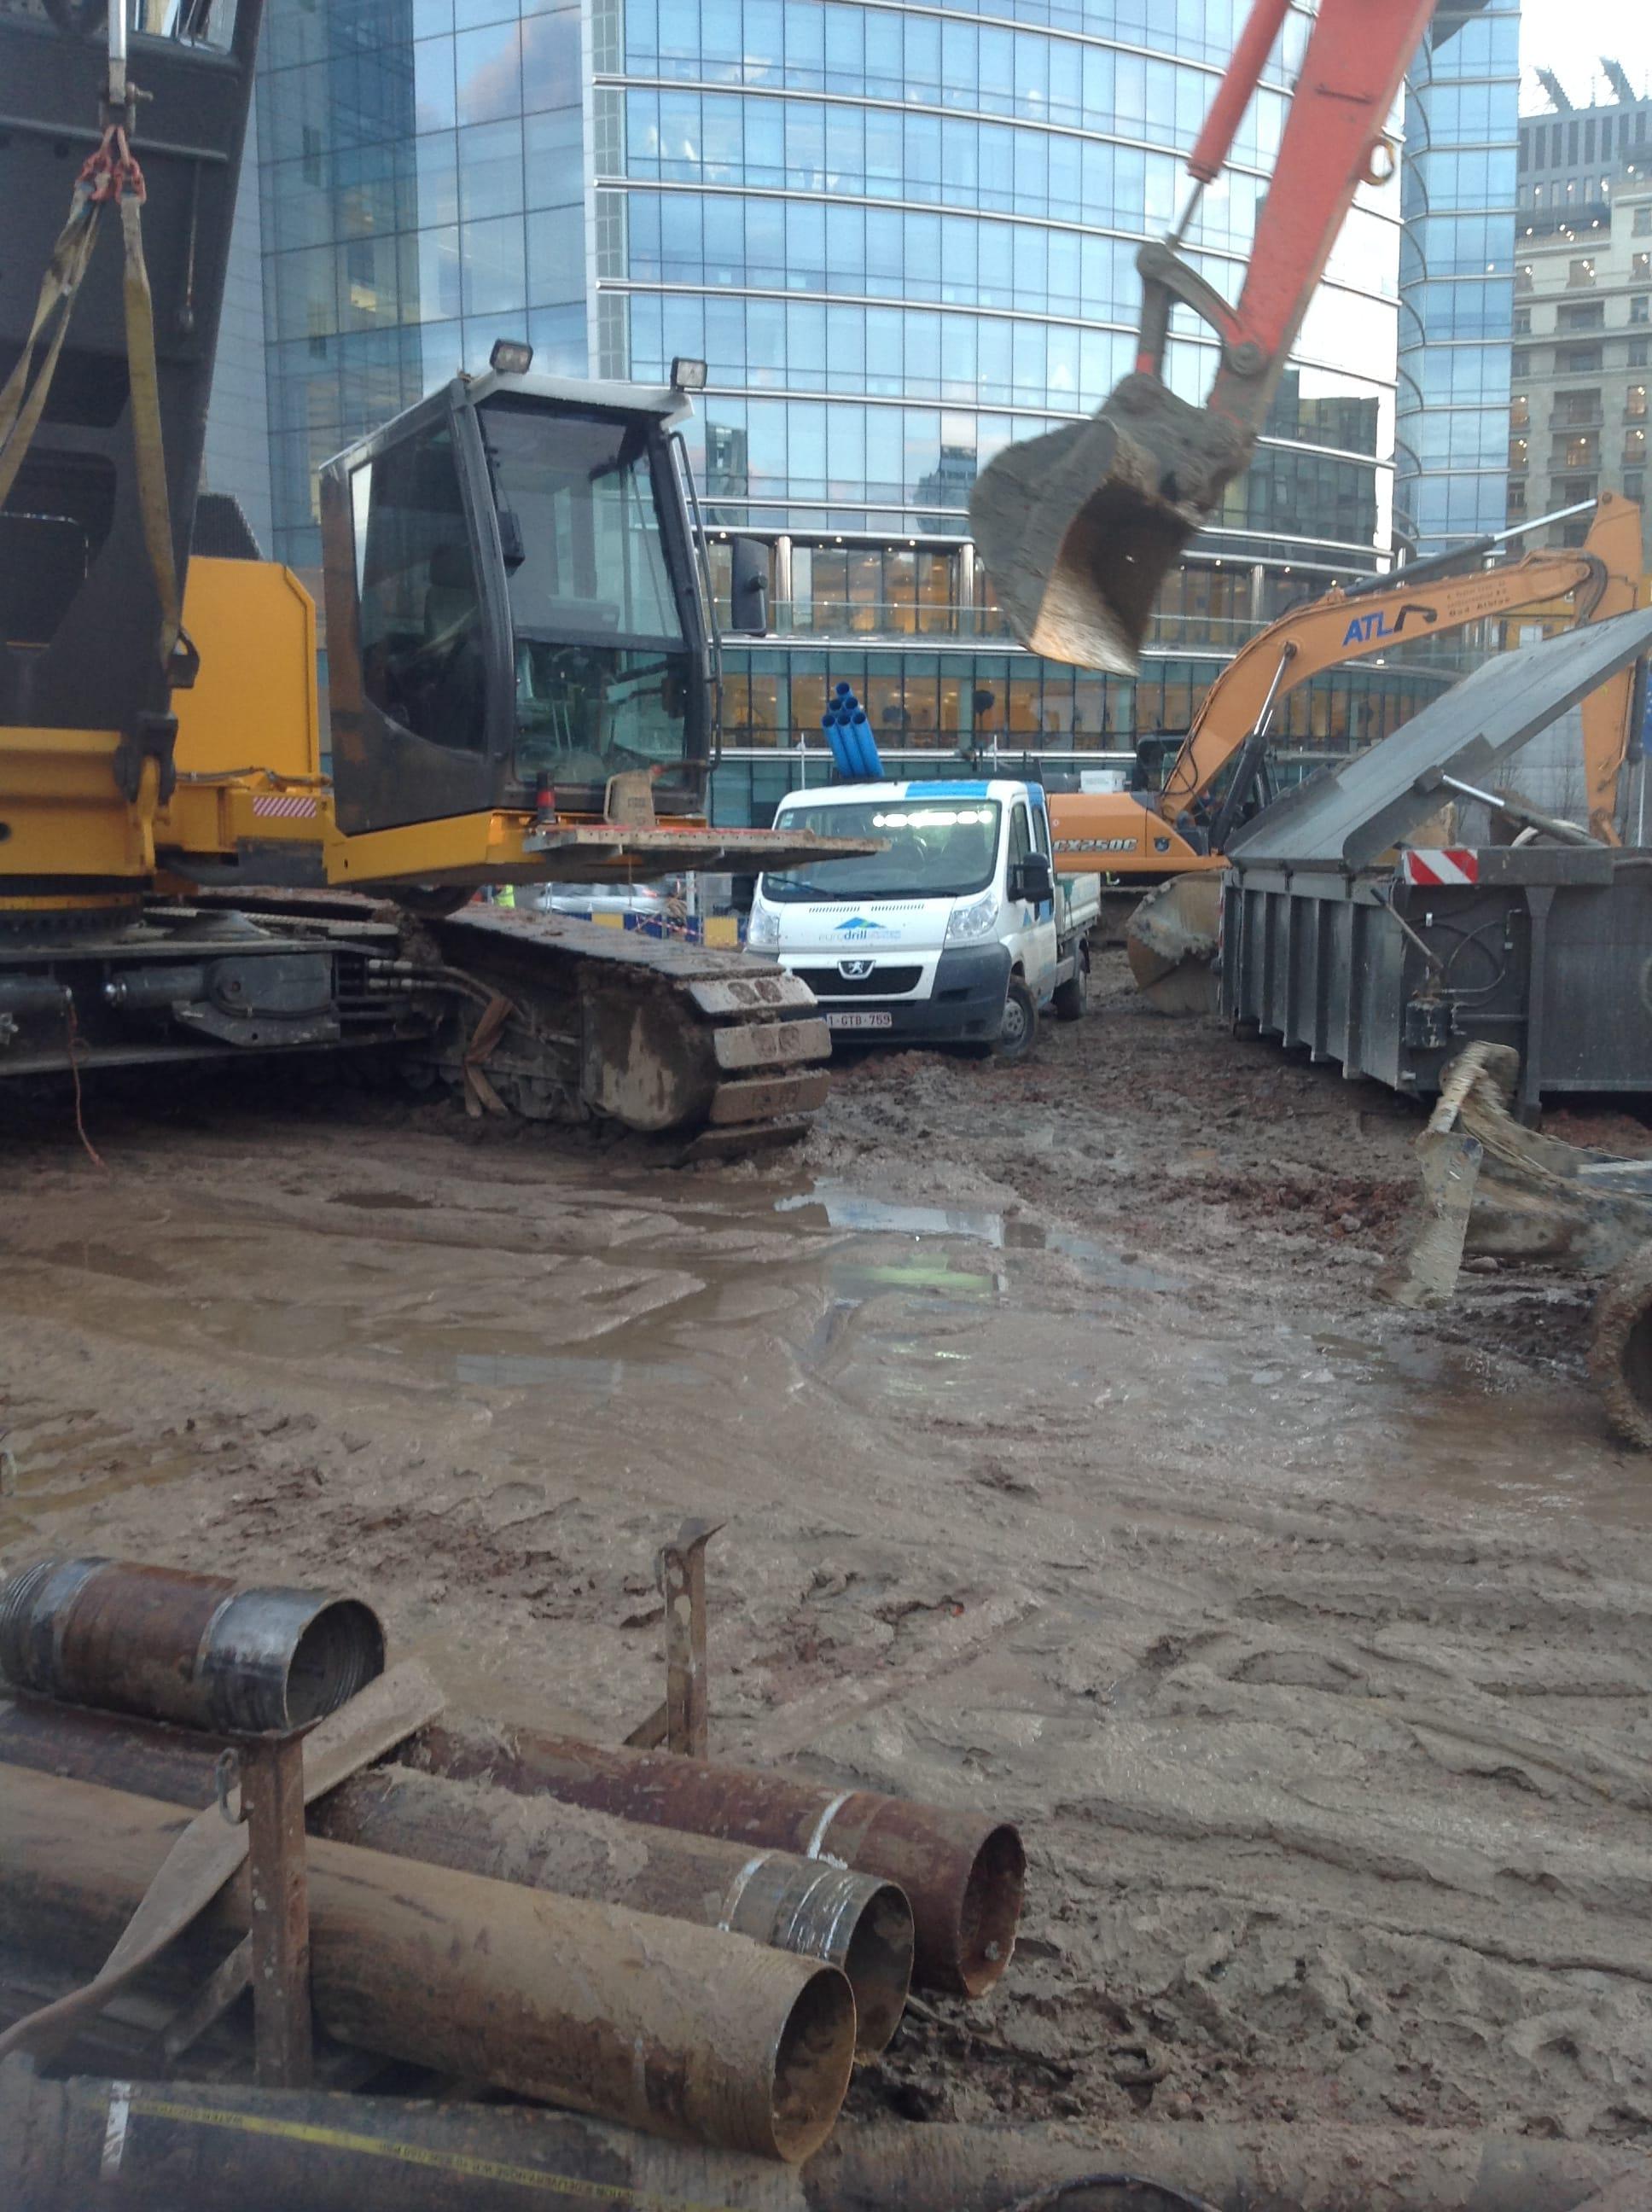 chantier-bruxelles-forage-installation-pompe-puits-geothermie-eurodrill-liege-belgique-1